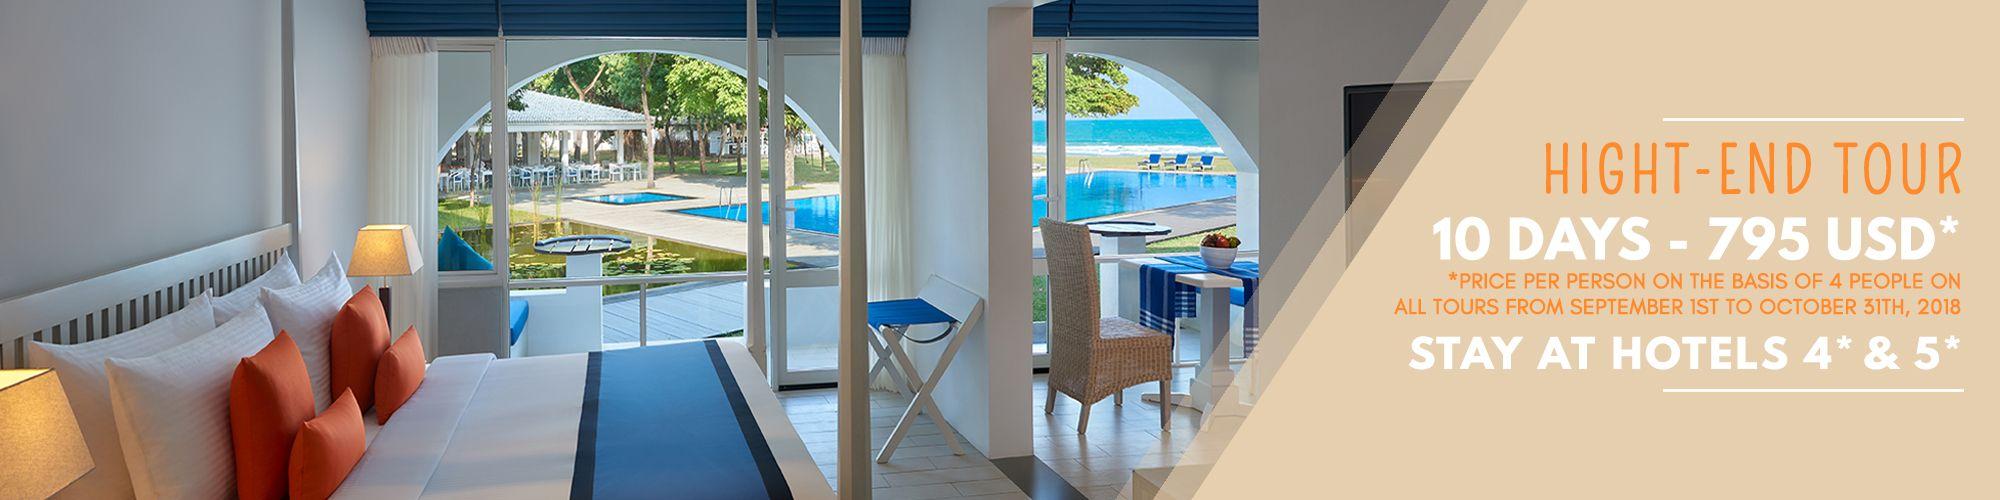 Trinco Blu by Cinnamon Hotel, Trincomalee, Sri Lanka